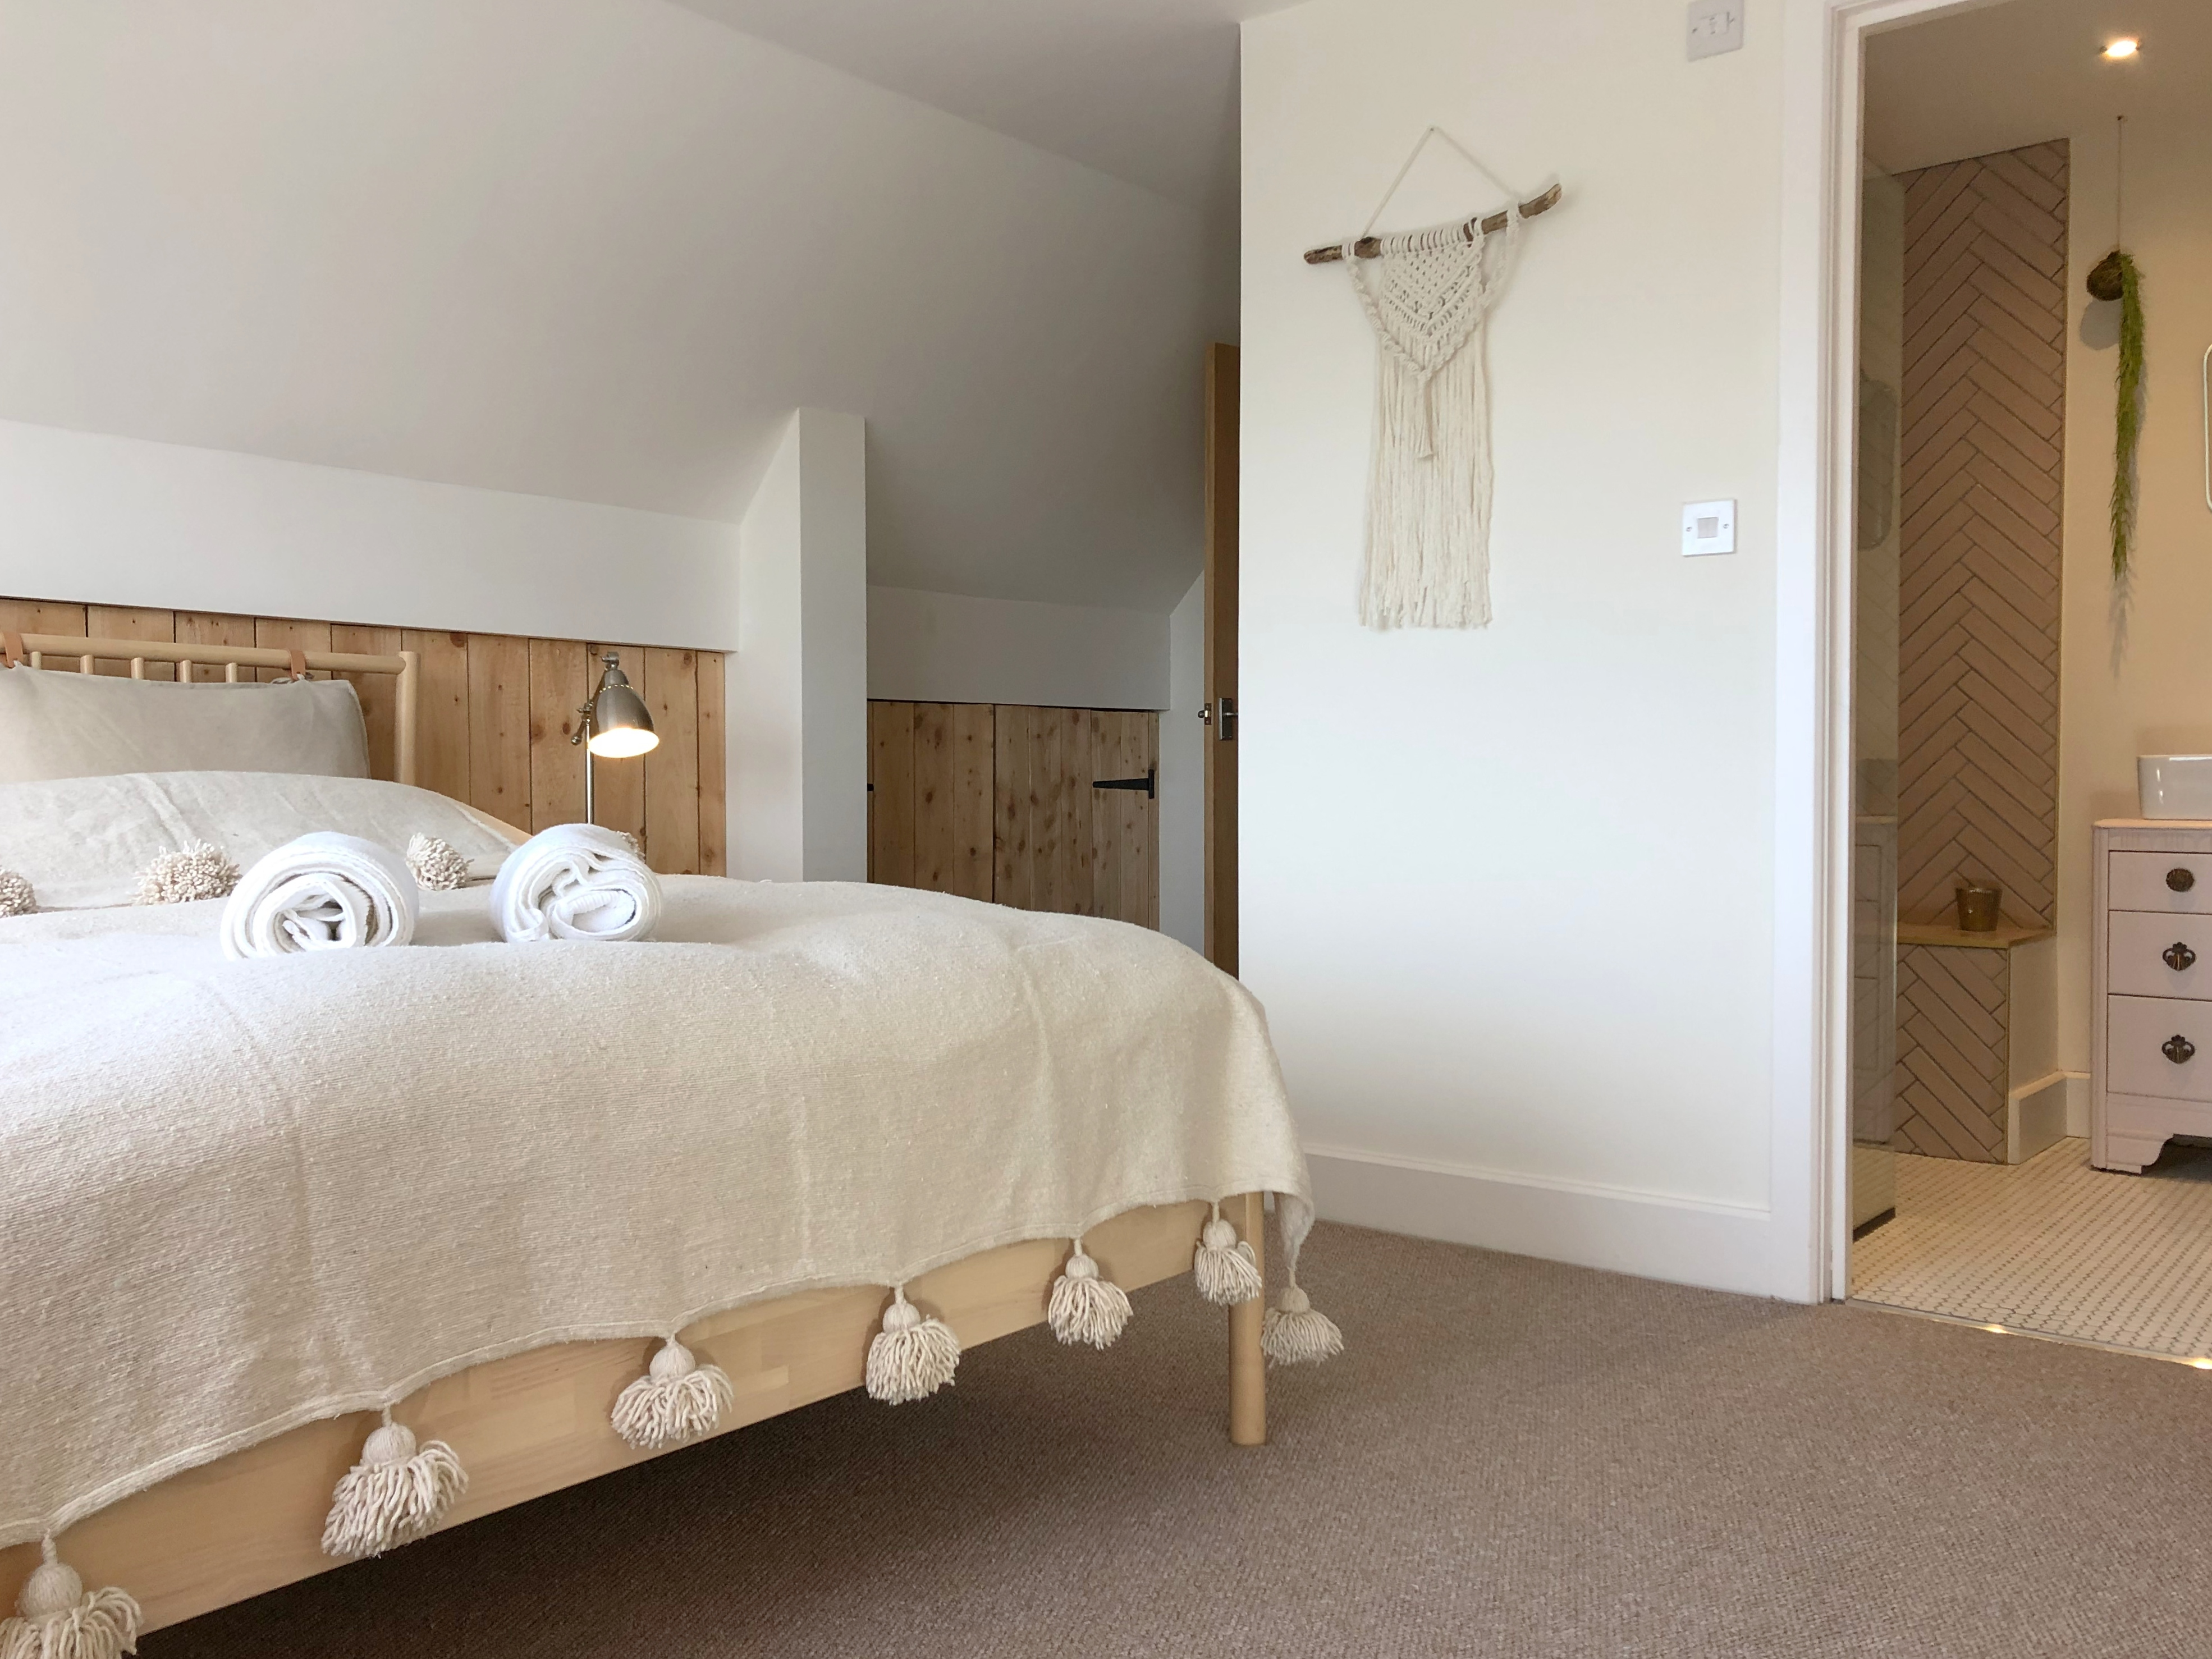 Master Bedroom - Ensuite - Sea views